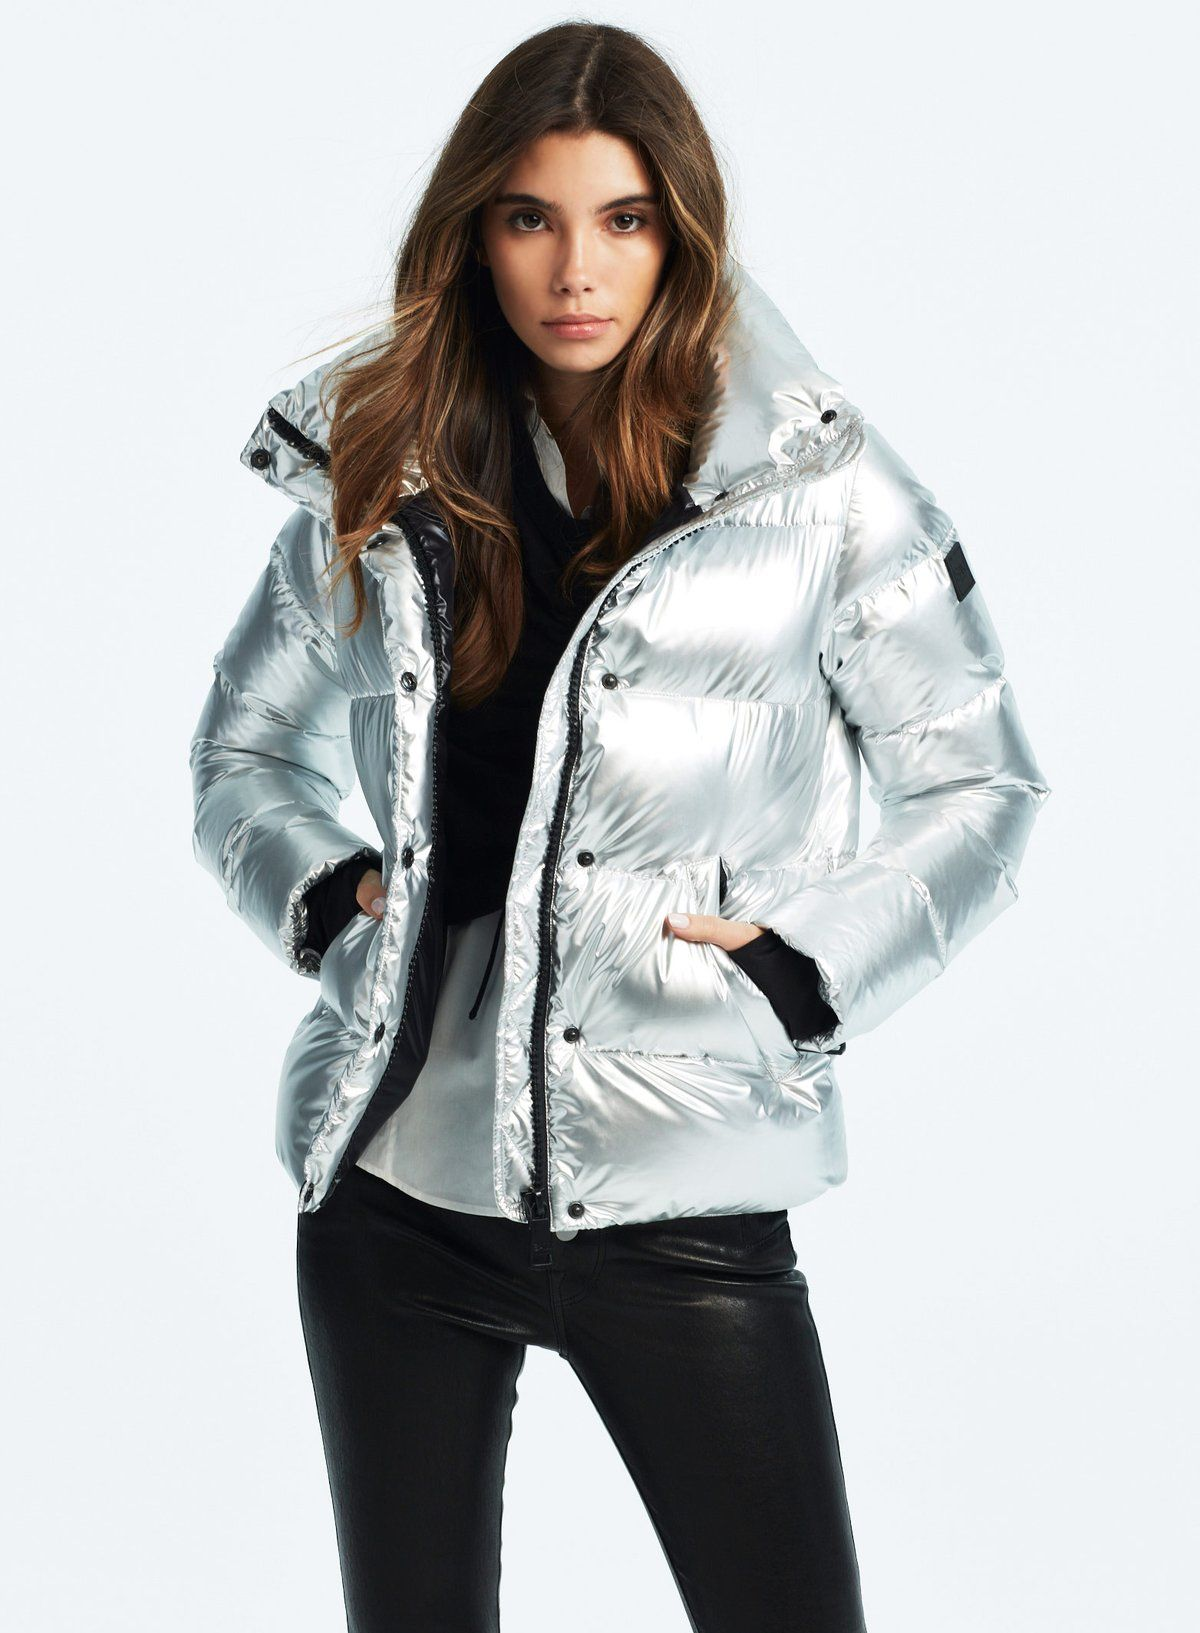 Puffy Jacket Silver Fashion Fashion Film Luxury Outerwear [ 1633 x 1200 Pixel ]